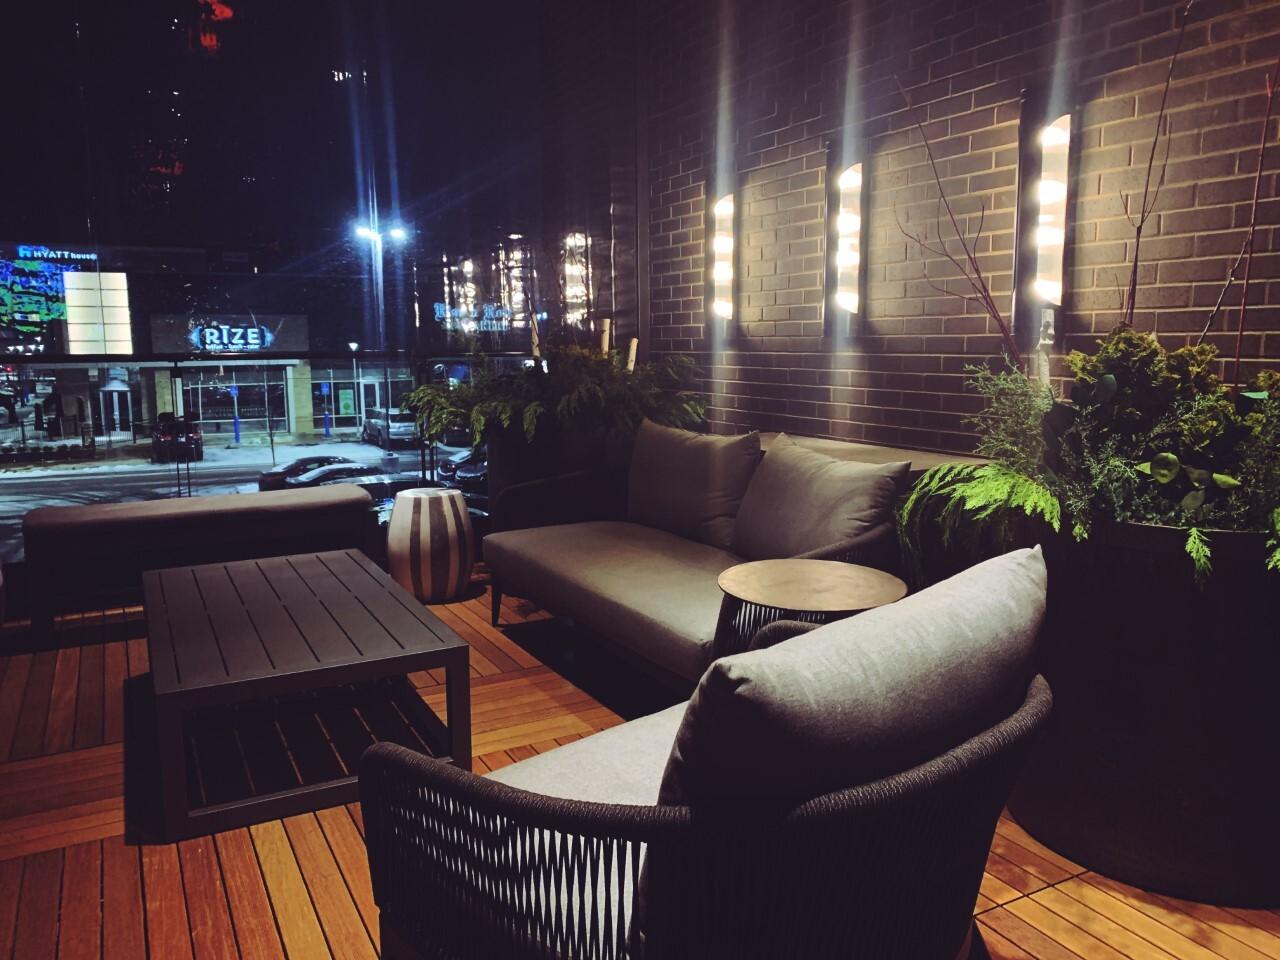 hc tavern patio 1.jpg